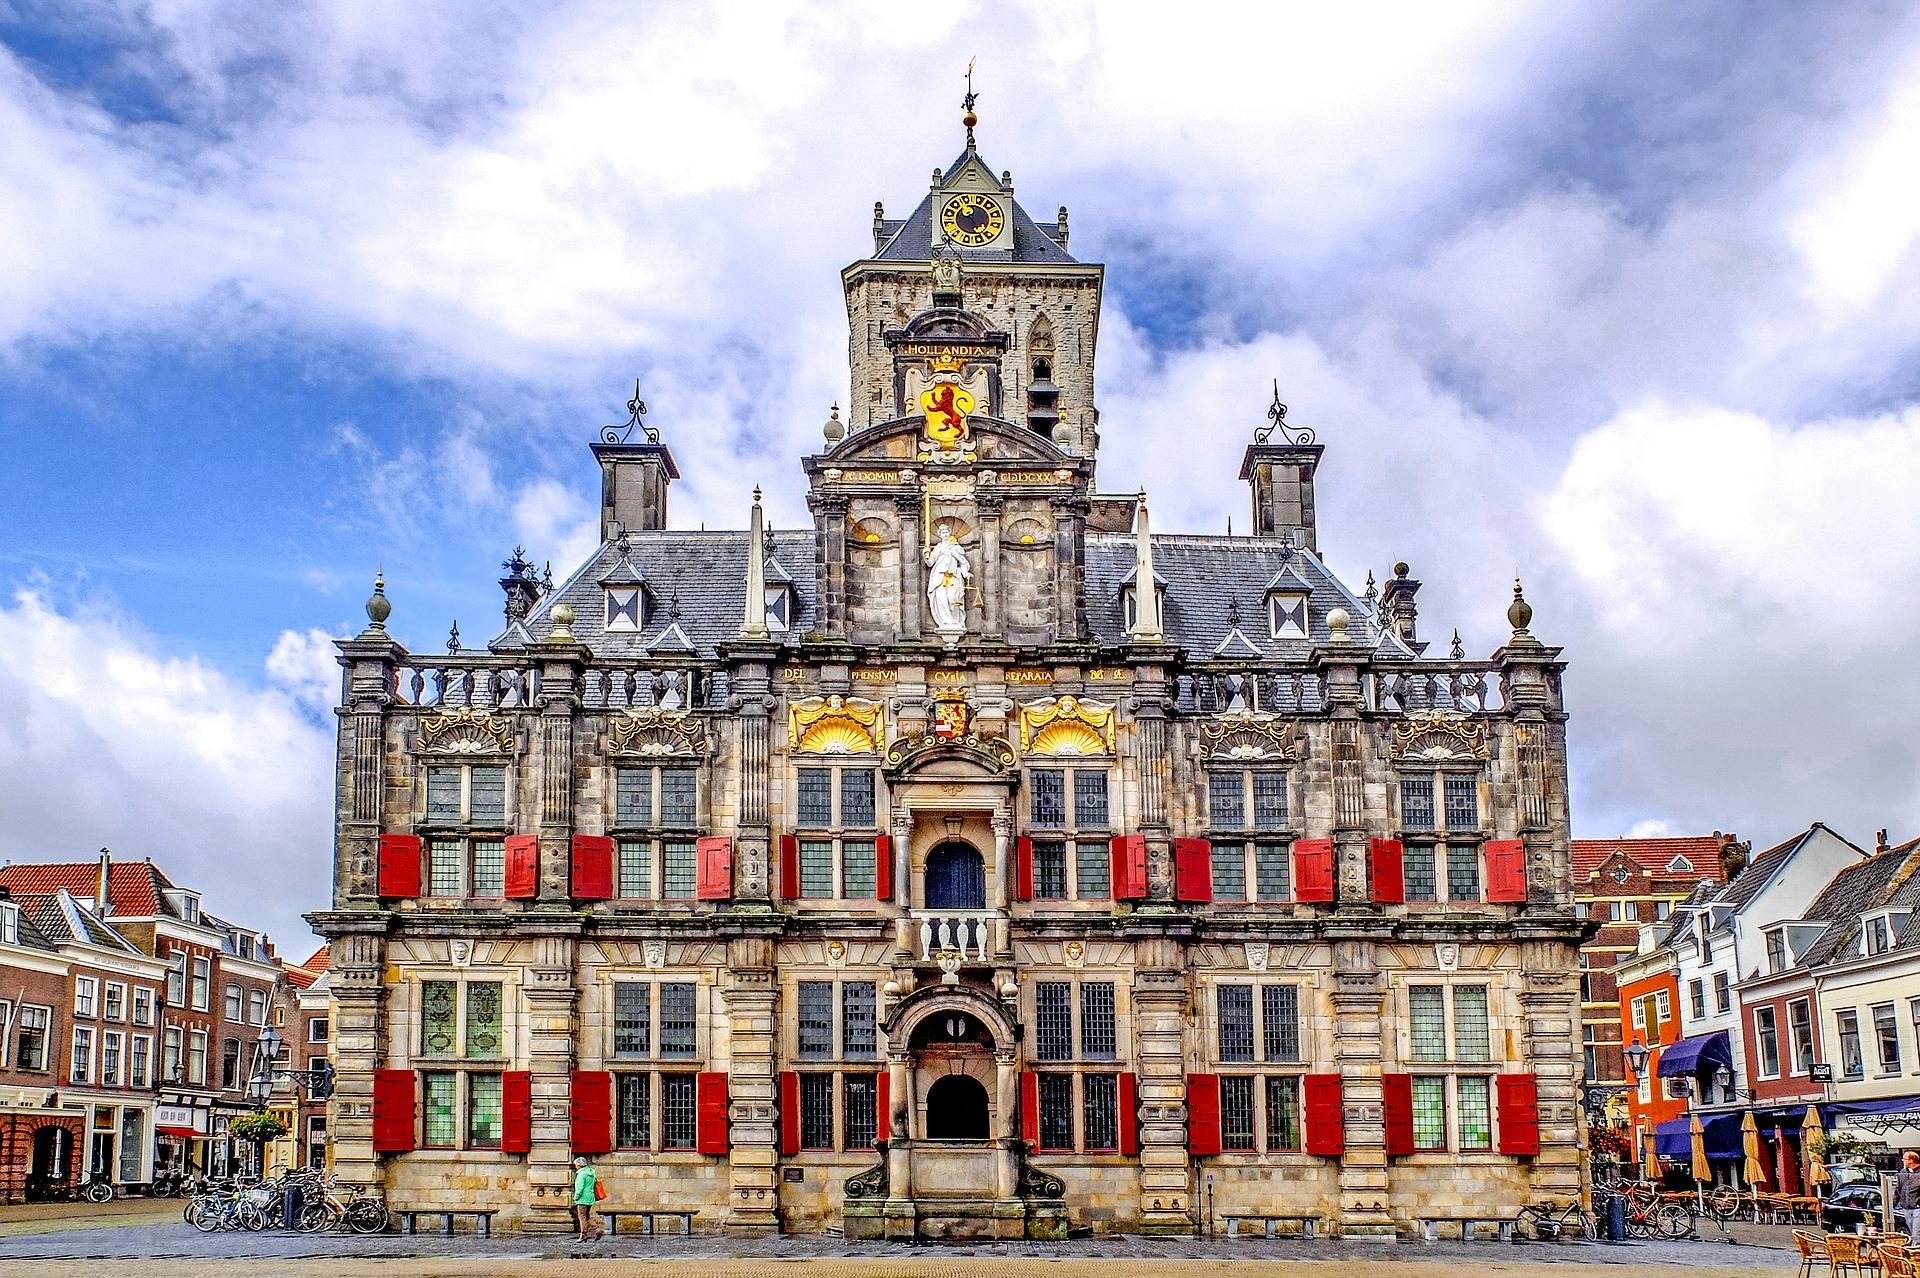 Best of the Netherlands - Delft City Hall, Delft, Netherlands